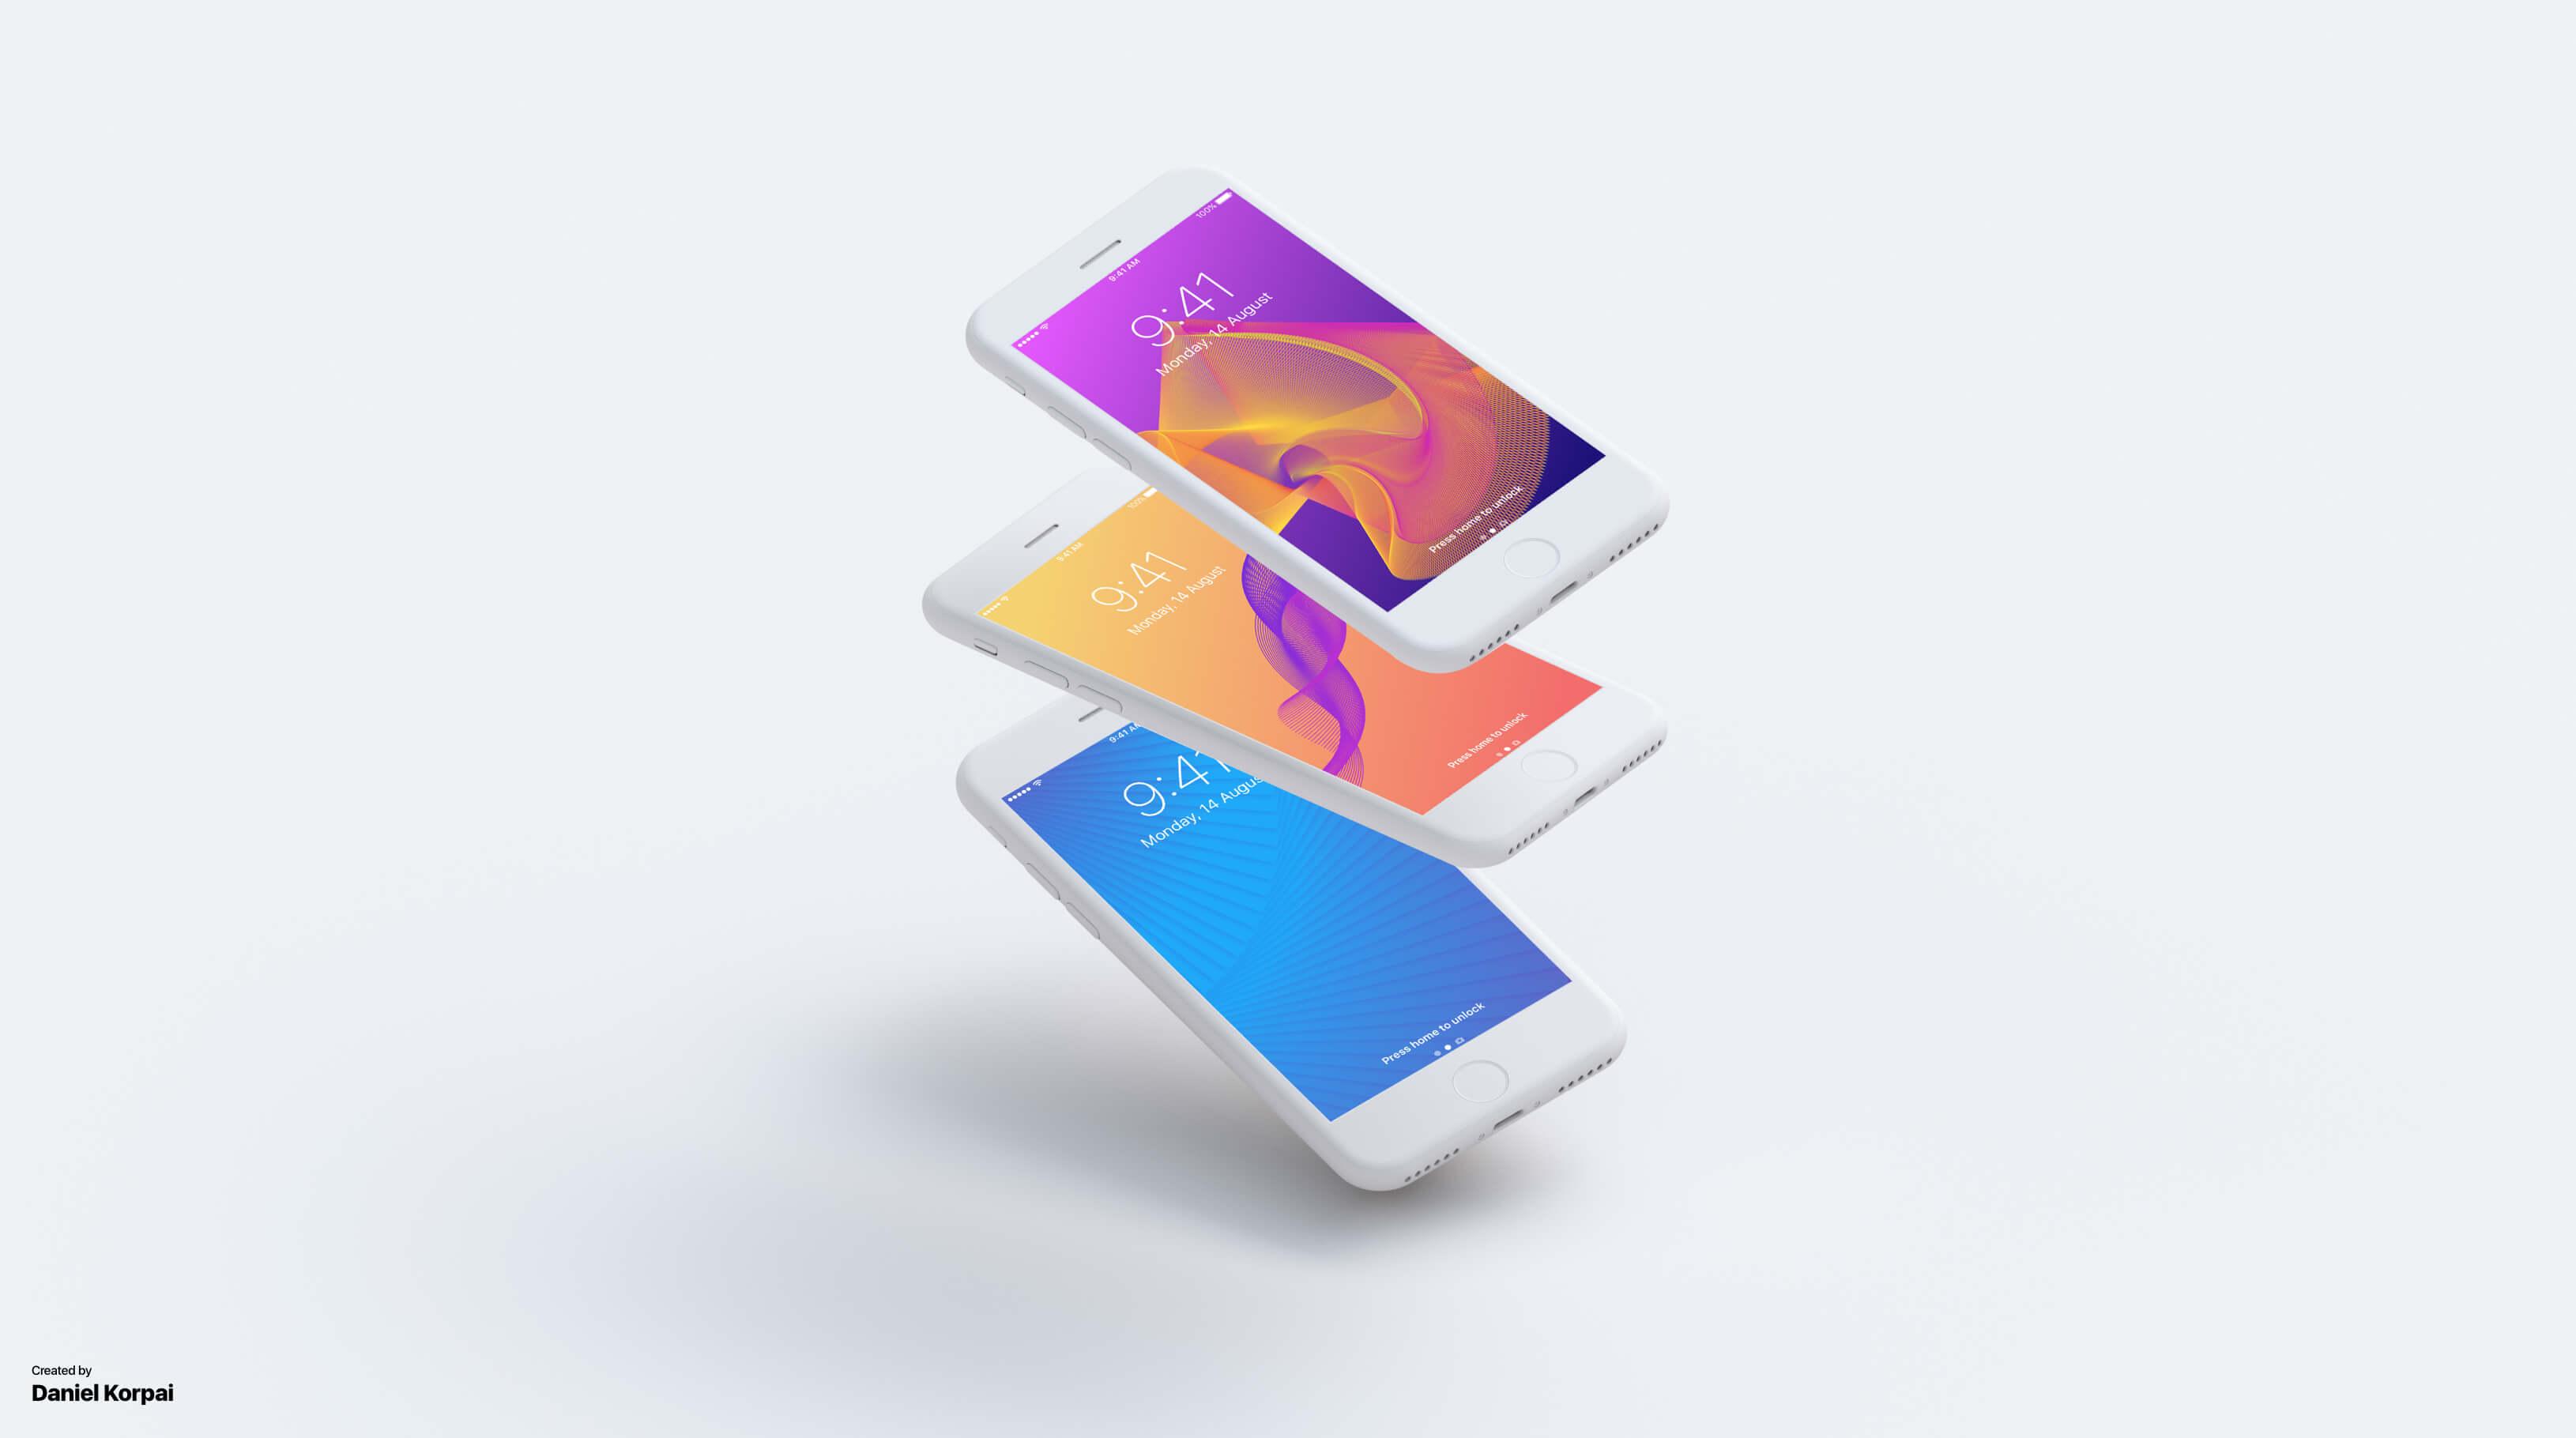 Looper Wallpapers presentation image